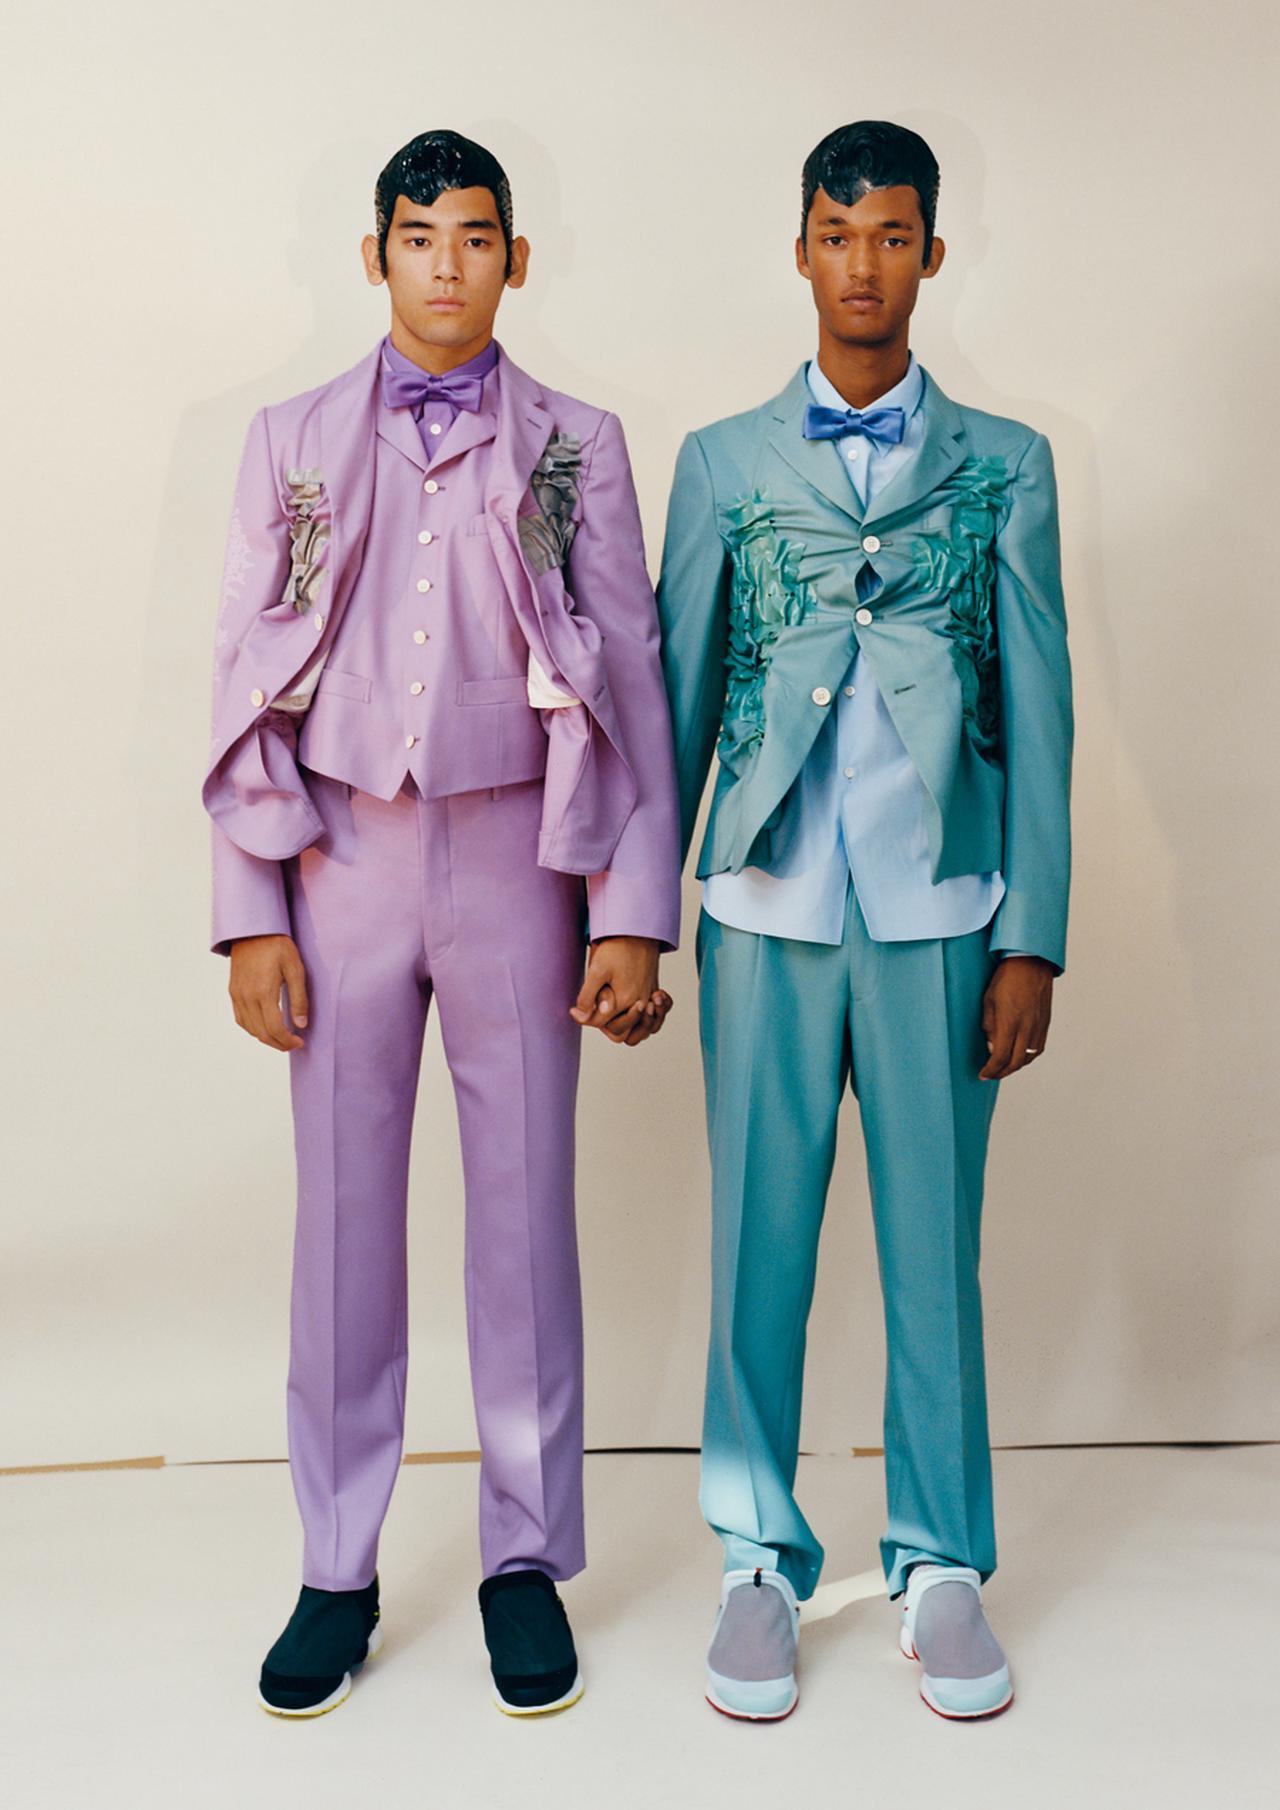 Images : 6番目の画像 - 「川久保 玲ーー ファッションの偉大なる解放者」のアルバム - T JAPAN:The New York Times Style Magazine 公式サイト